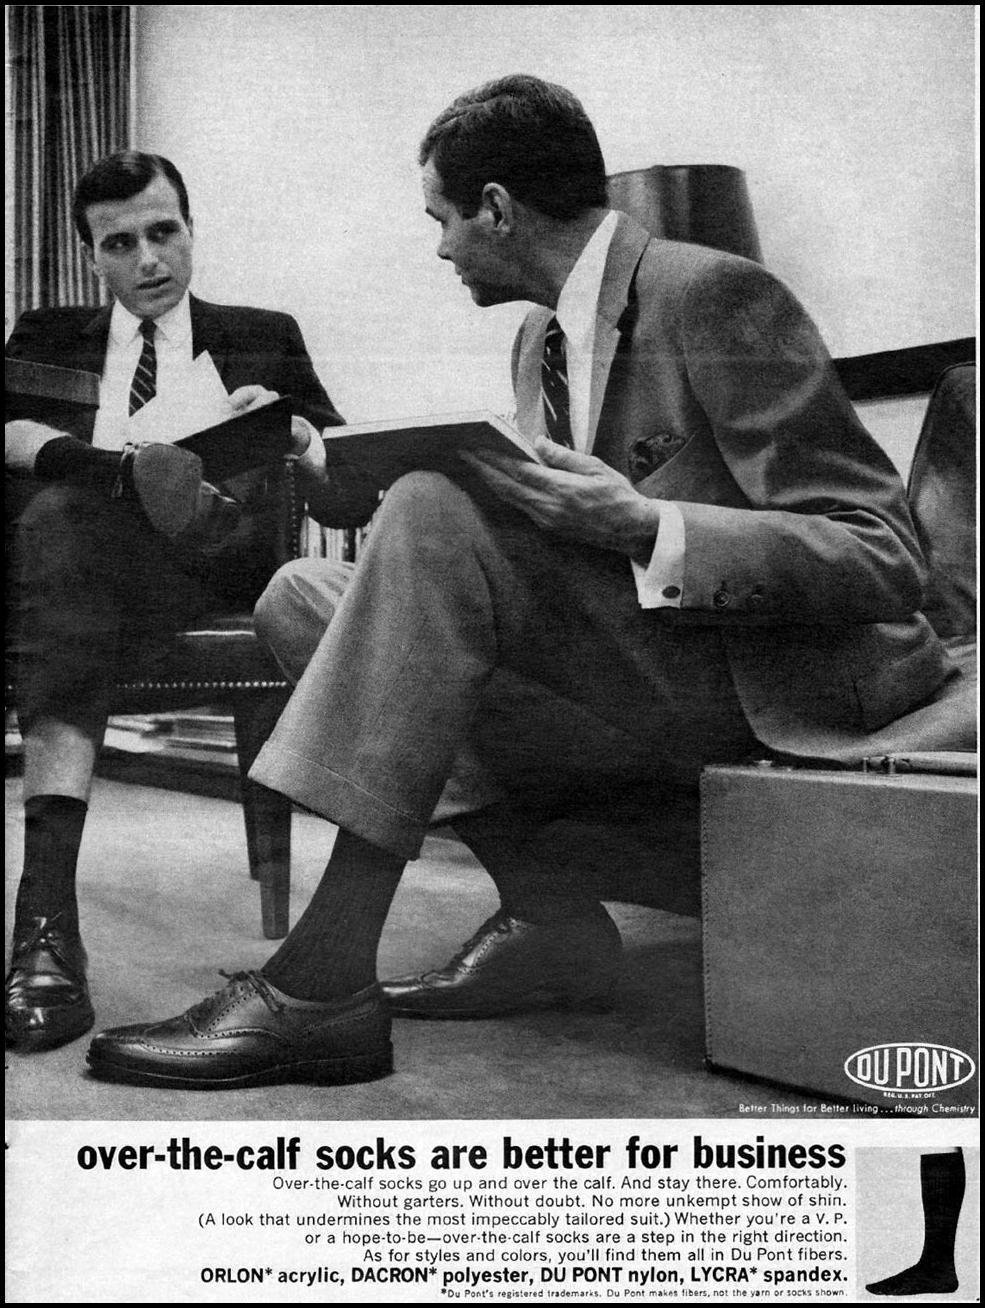 DU PONT ARTIFICIAL FIBERS NEWSWEEK 10/12/1964 p. 13